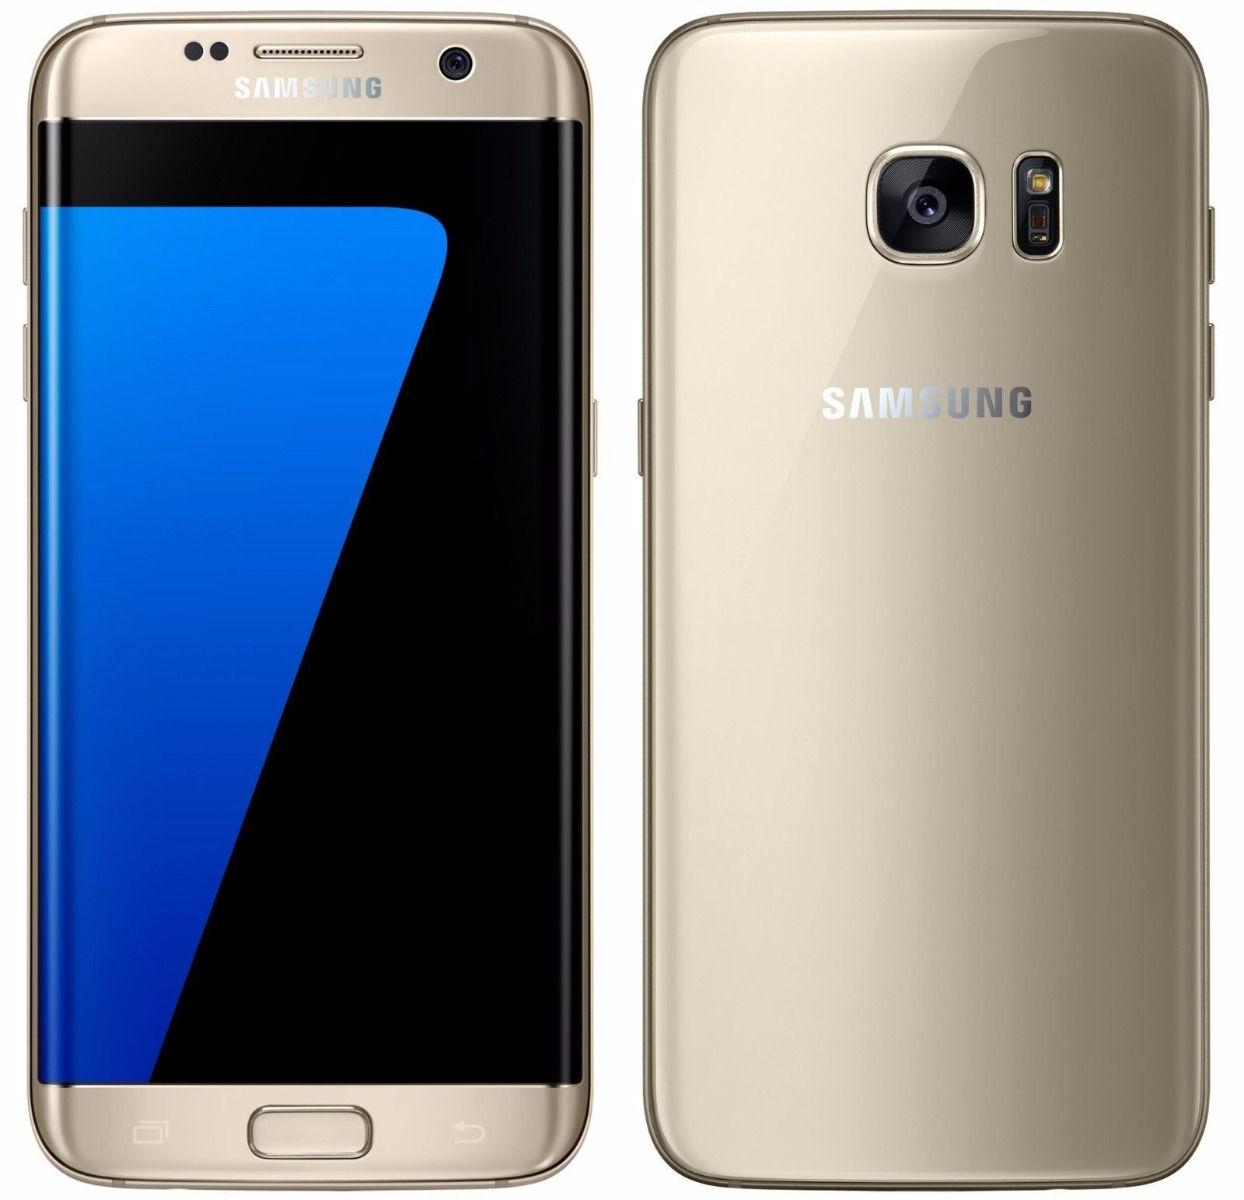 Samsung Galaxy S7 Edge 32GB SM-G935T Unlocked GSM 4G LTE ...